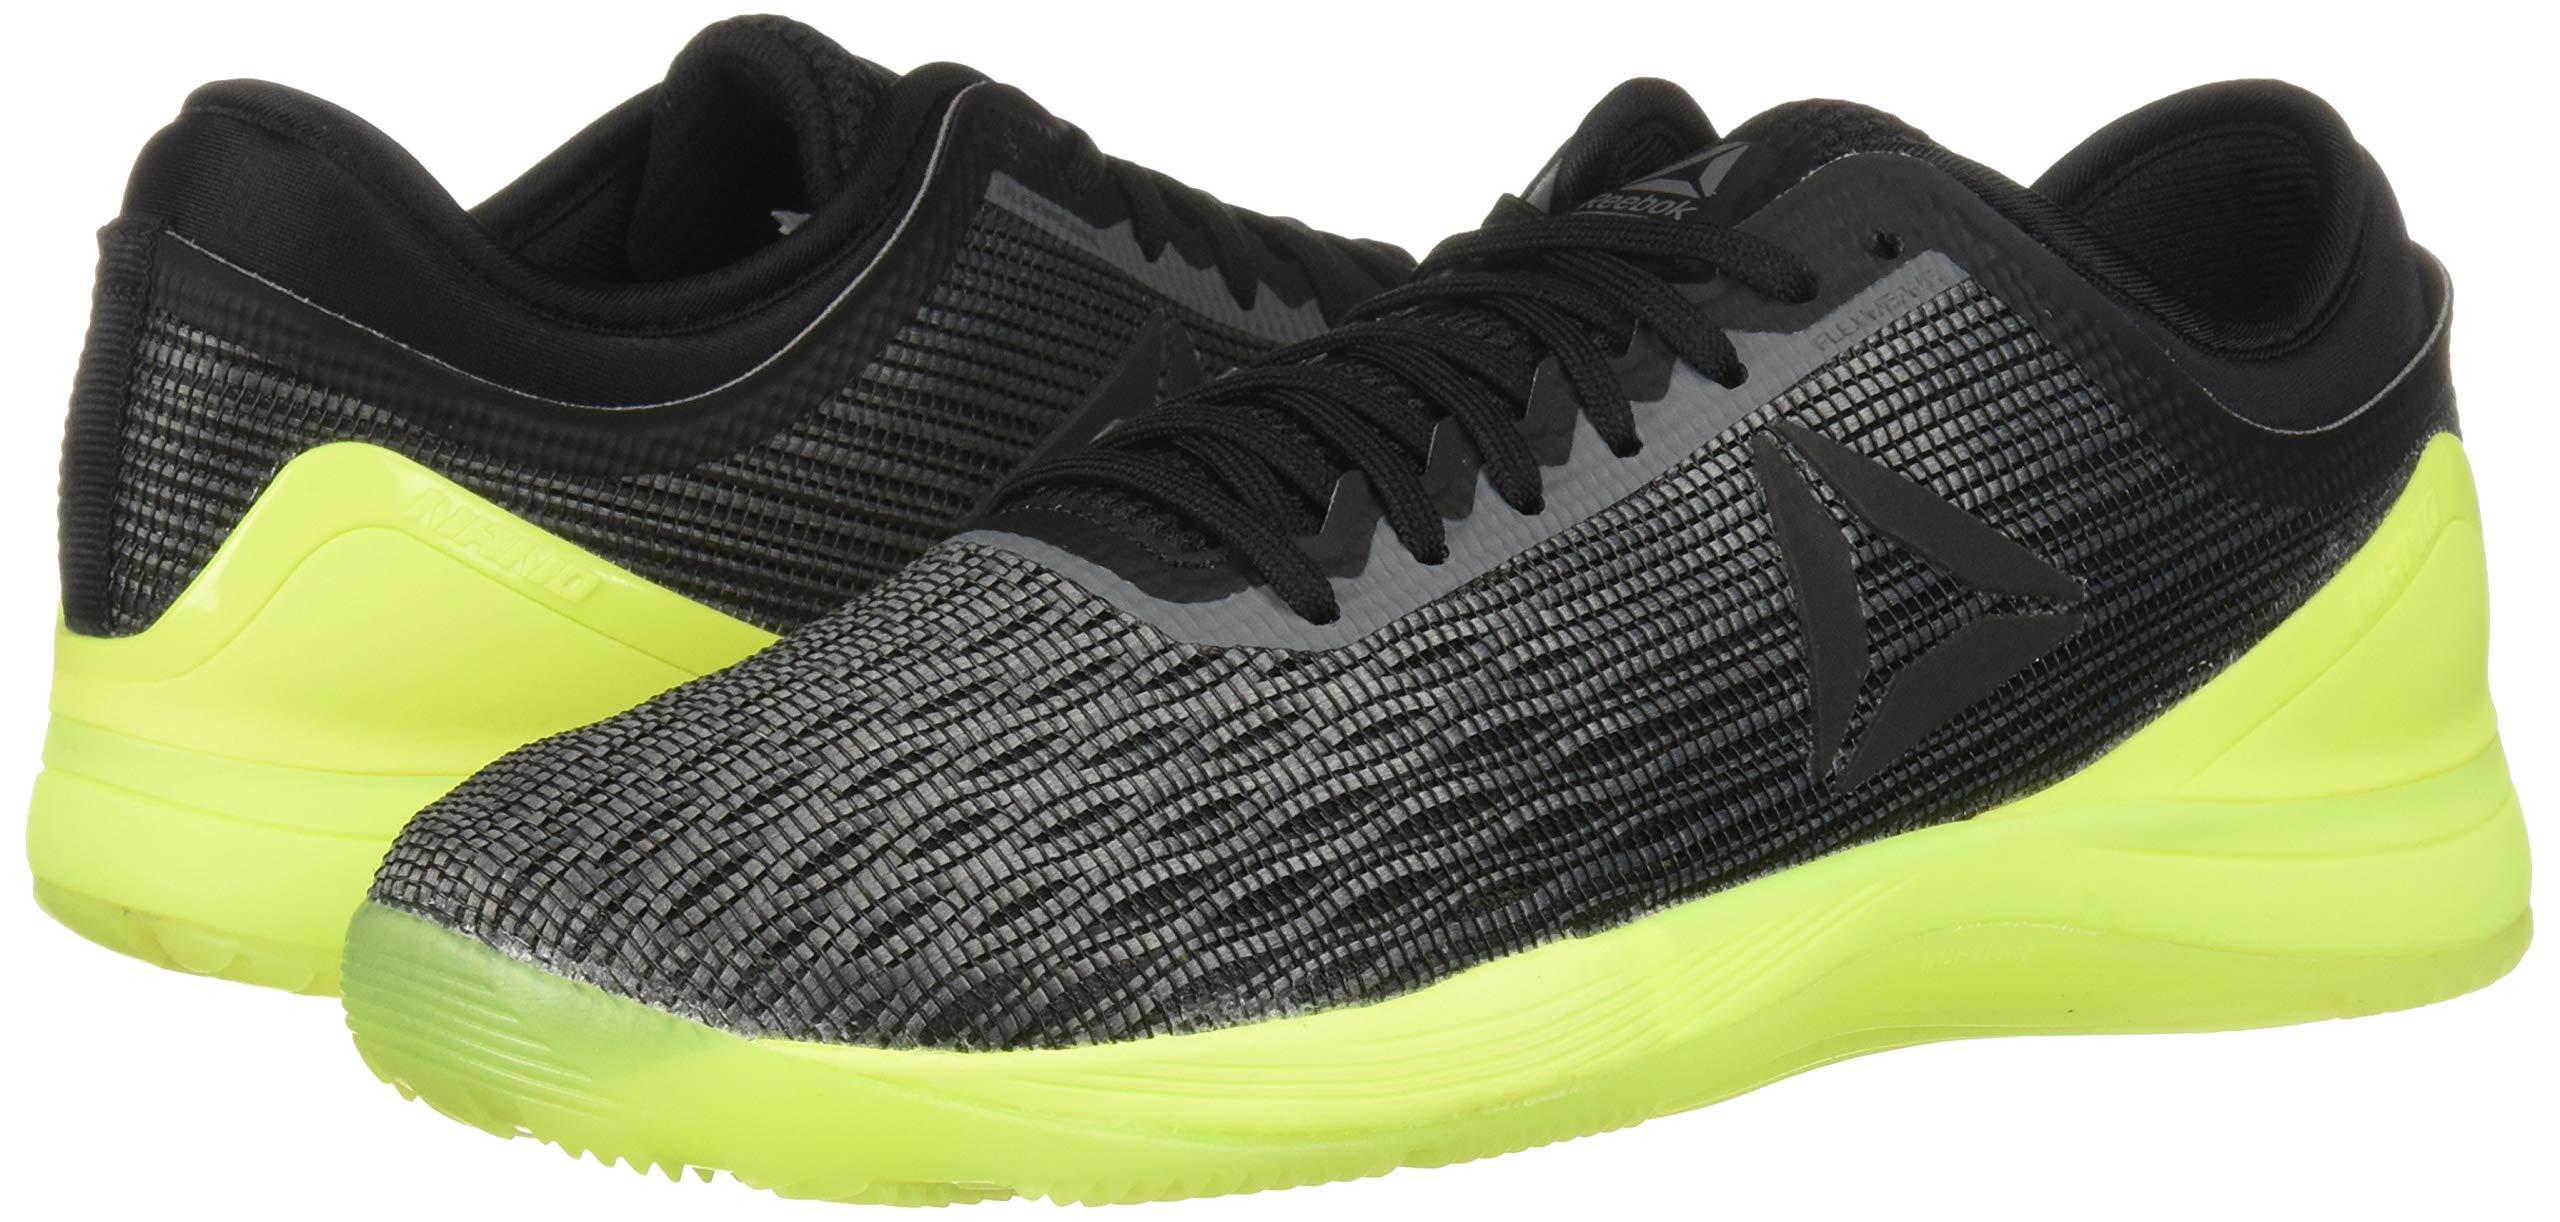 Reebok Men's CROSSFIT Nano 8.0 Sneaker, Alloy/Black/Solar Yellow, 6.5 M US by Reebok (Image #6)